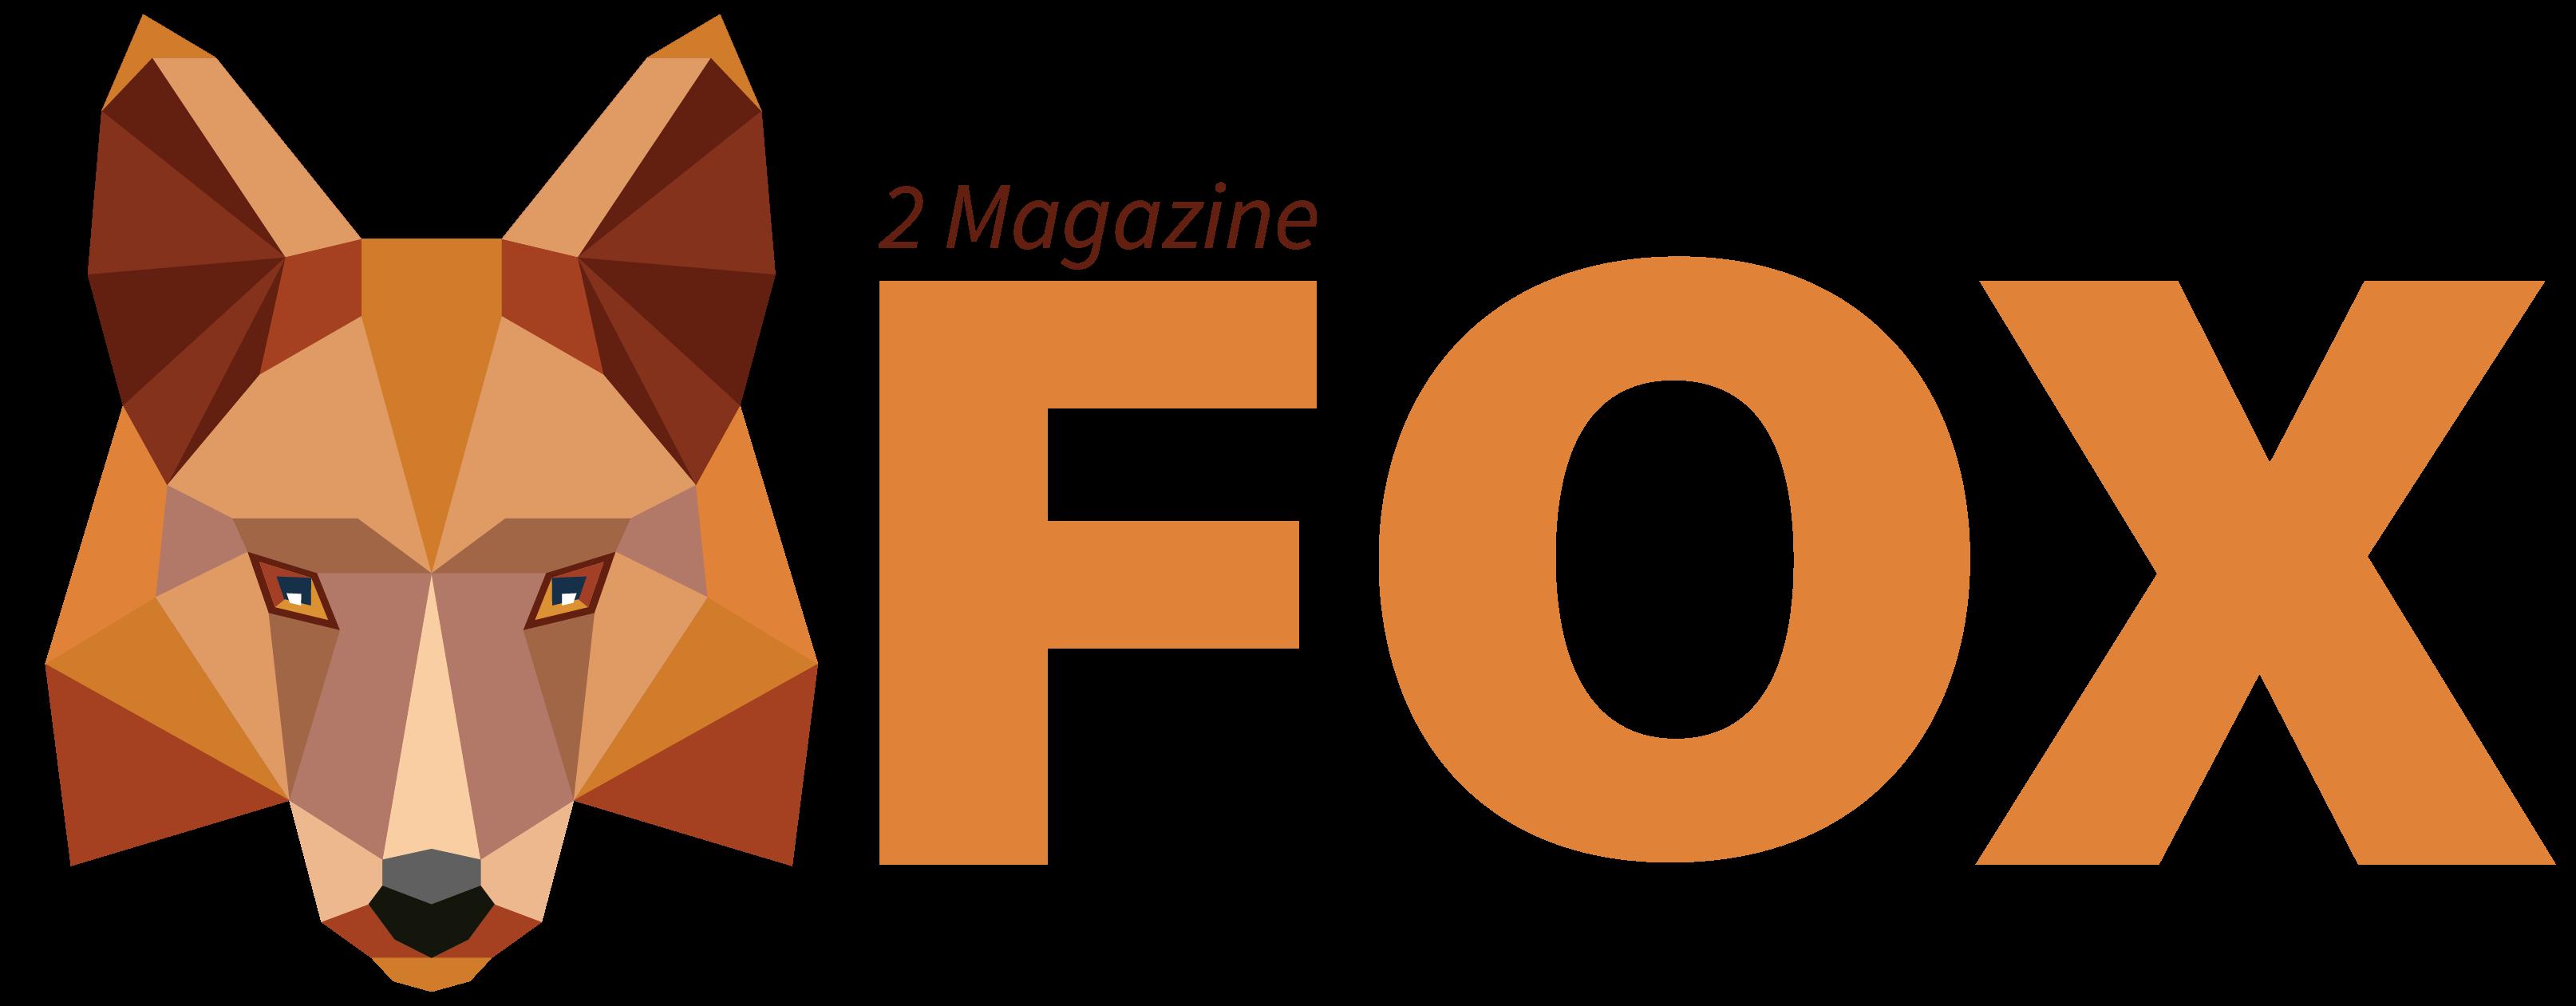 Fox 2 Magazine